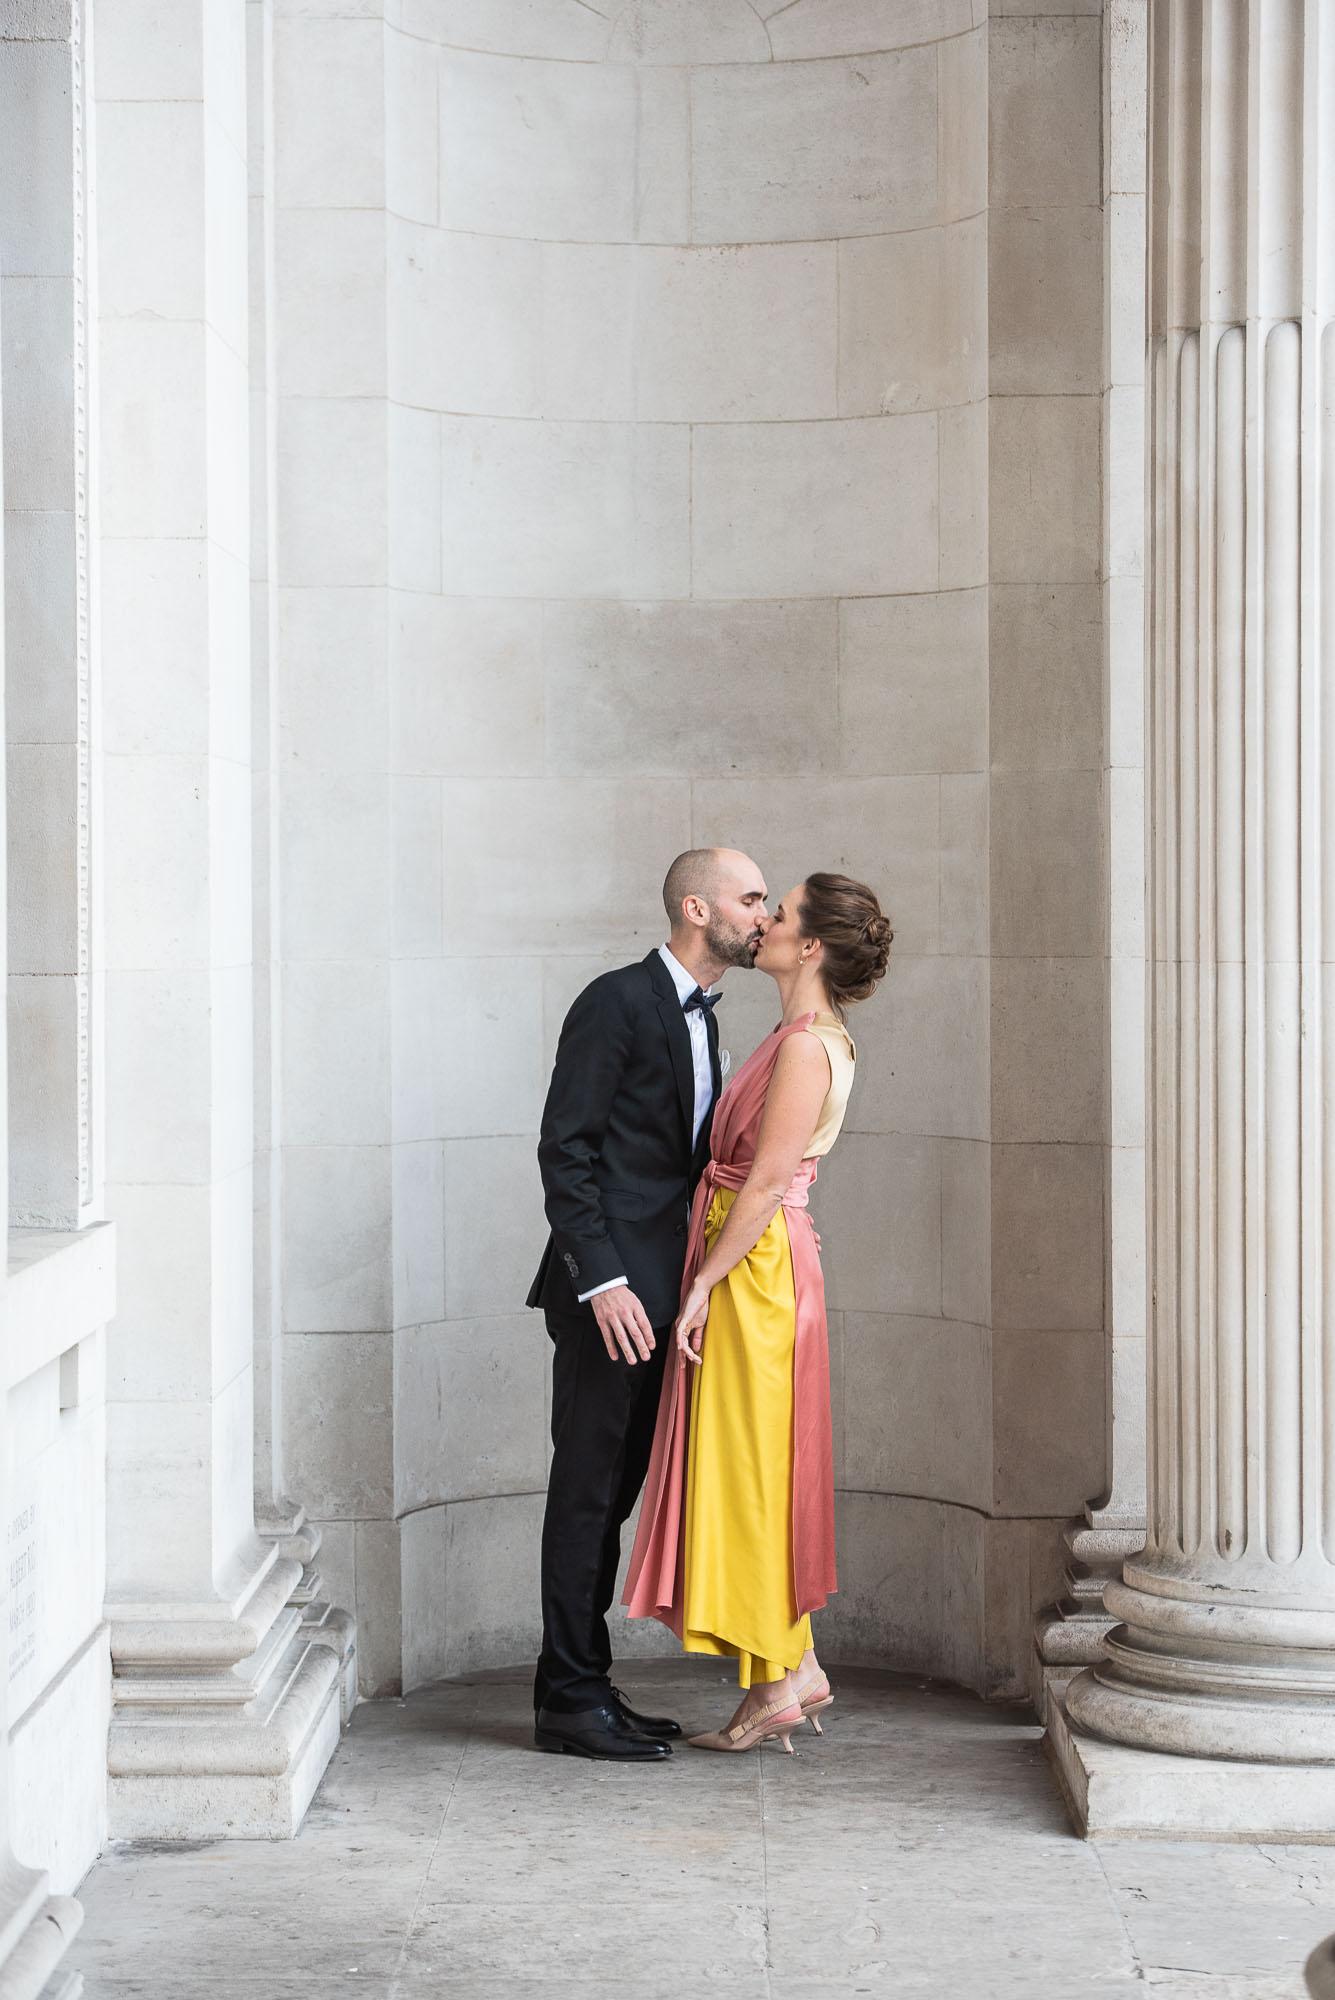 Our Wedding_HR (20 of 176).jpg